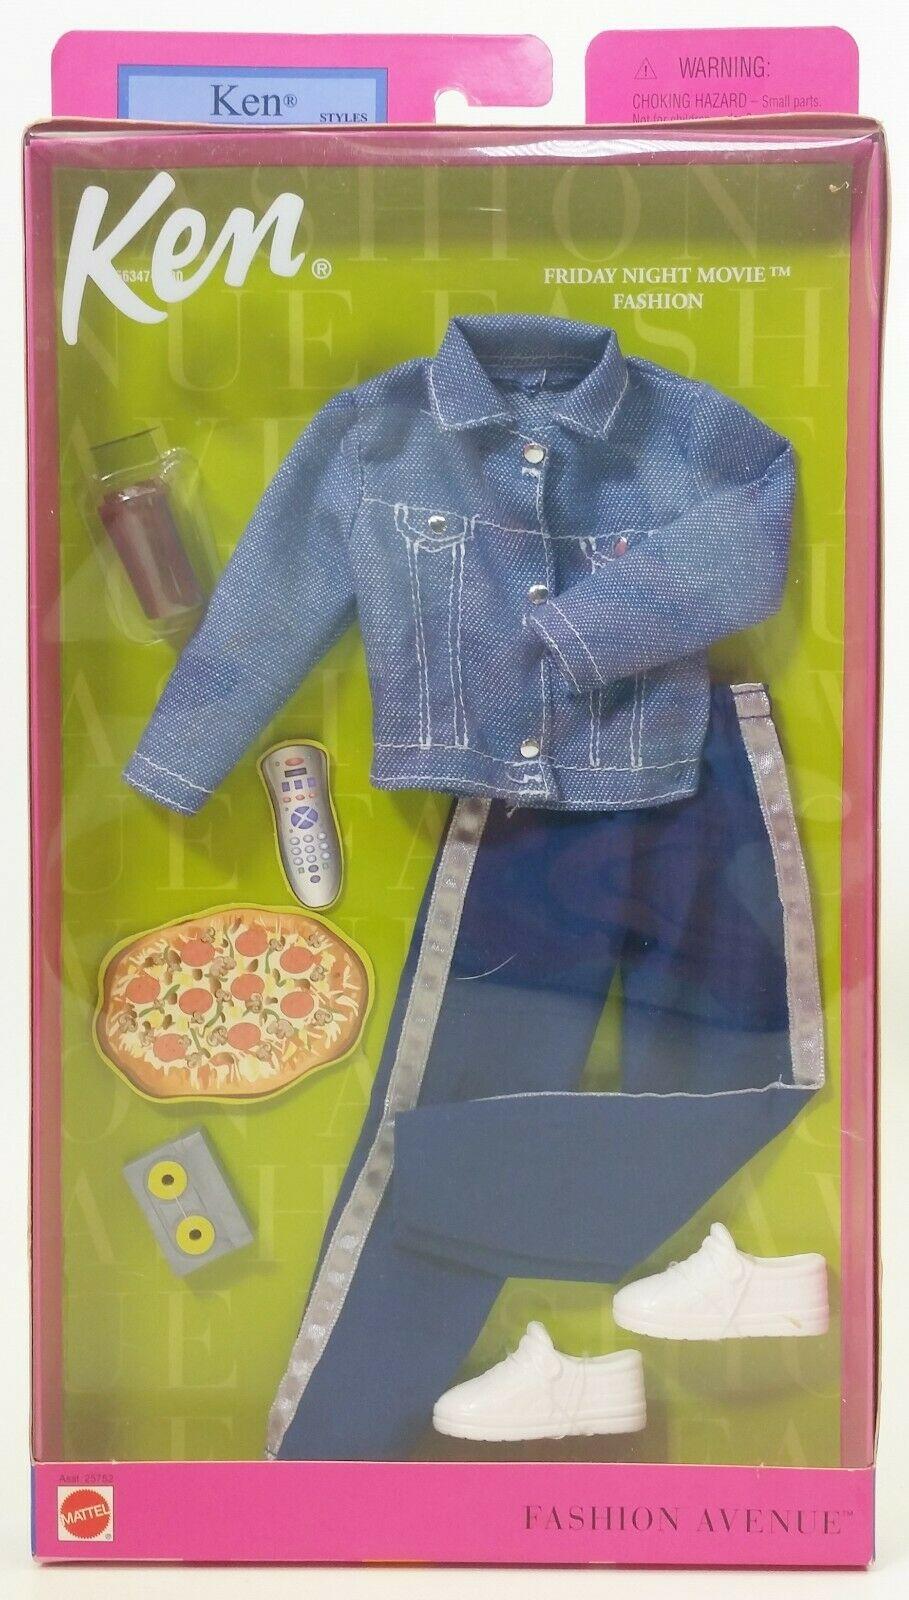 Mattel Ken Styles Friday Night Movie Fashion Avenue Set No 25752 Nrfb 74299257520 Ebay Doll Clothes Barbie Vintage Barbie Clothes Barbie Doll Accessories